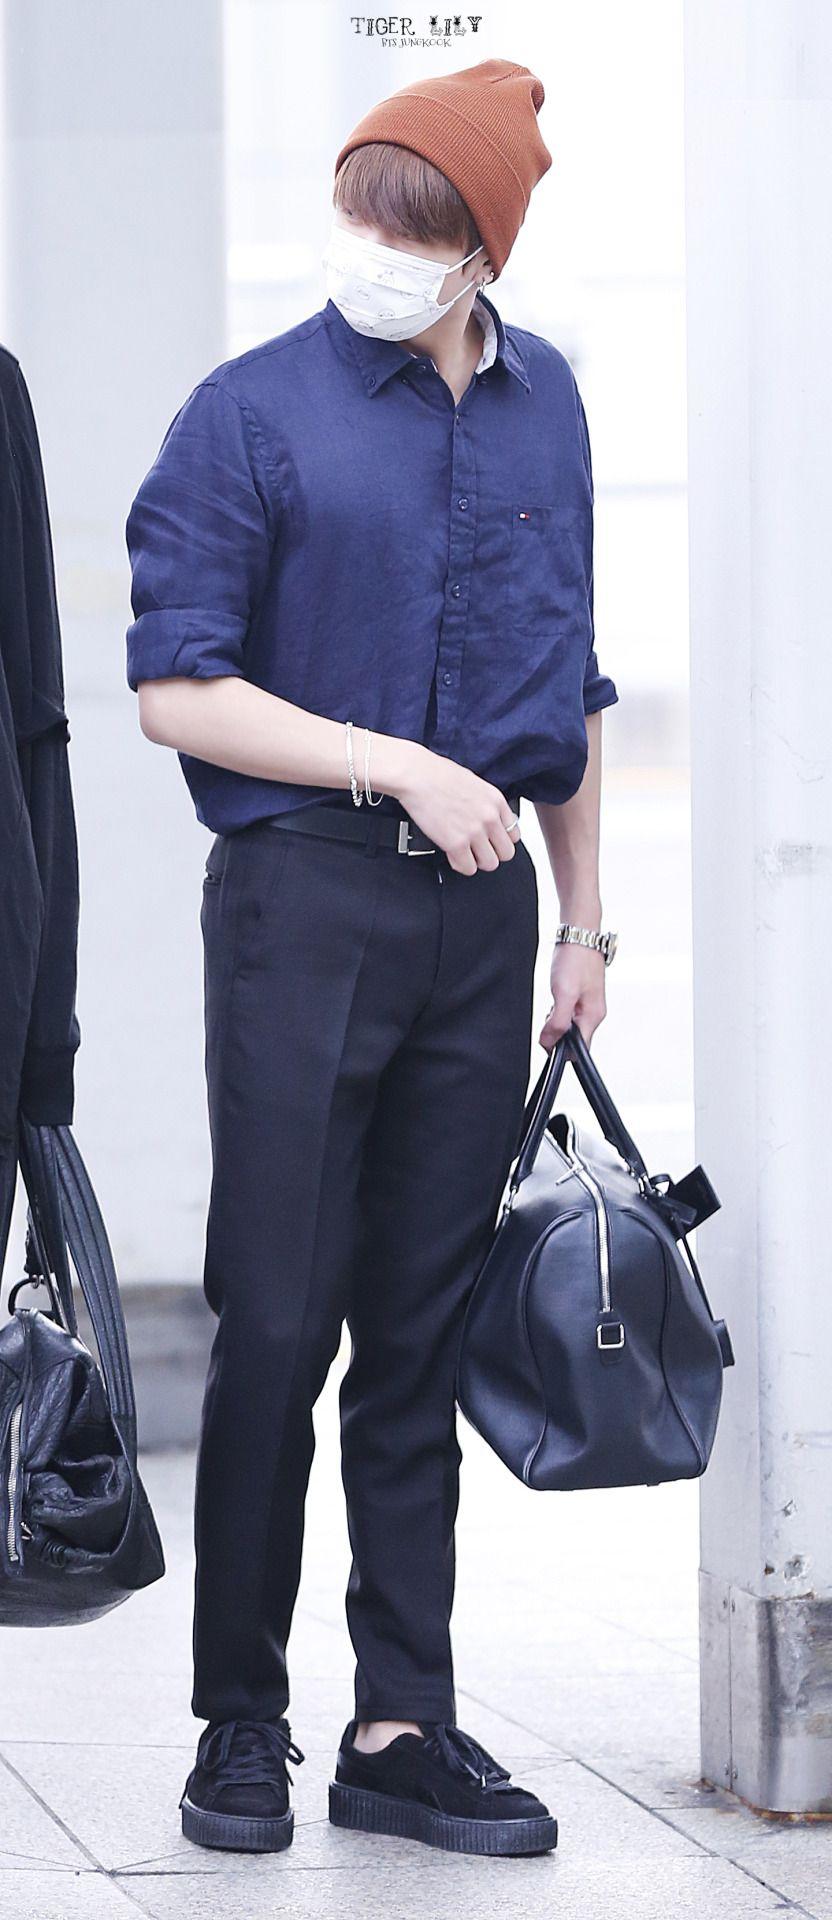 Jungkook #airport fashion © TIGERLILY | Do not edit